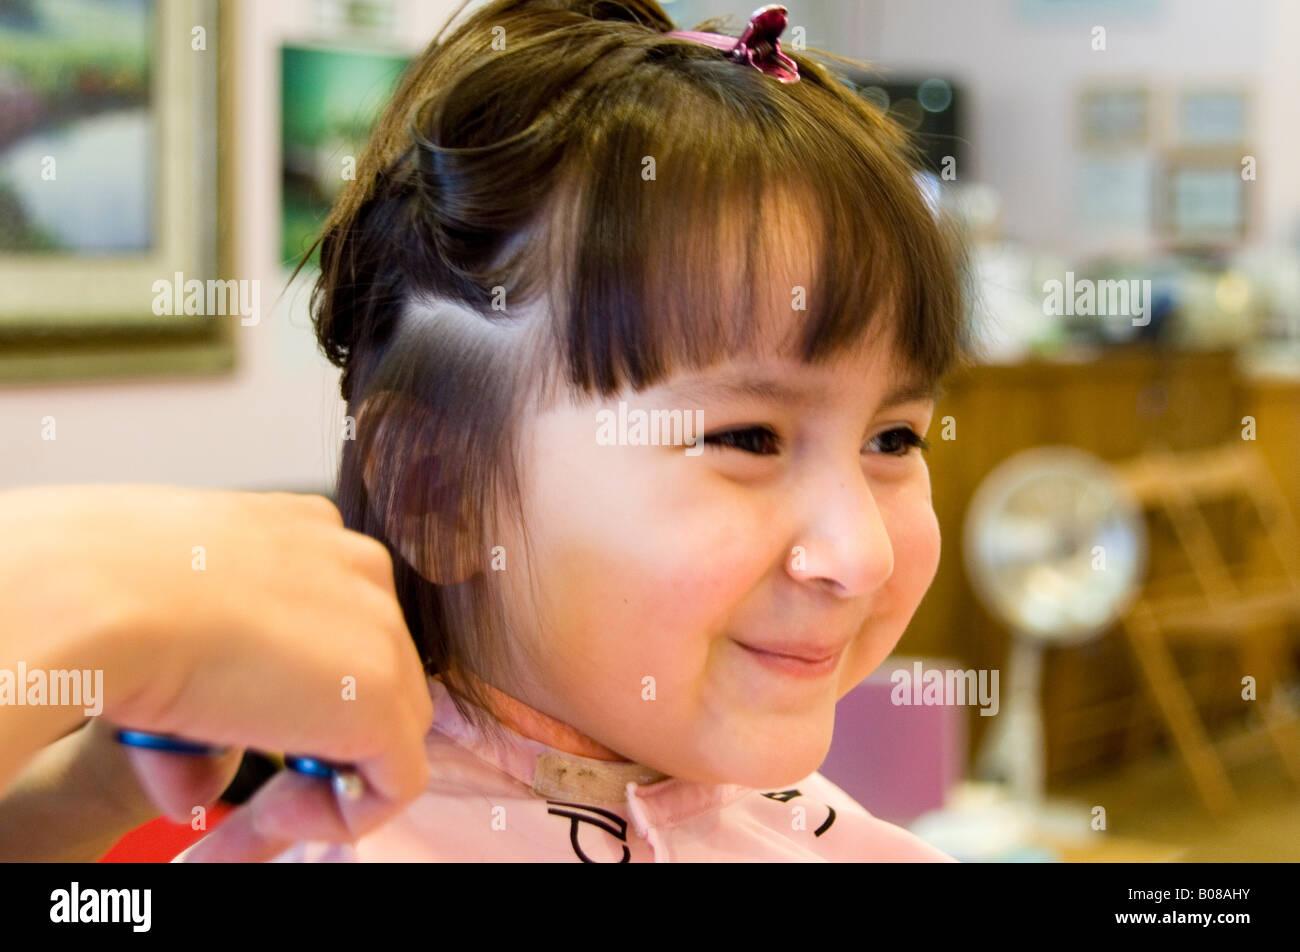 Little Girl Getting Her Hair Cut Stock Photo 17394327 Alamy